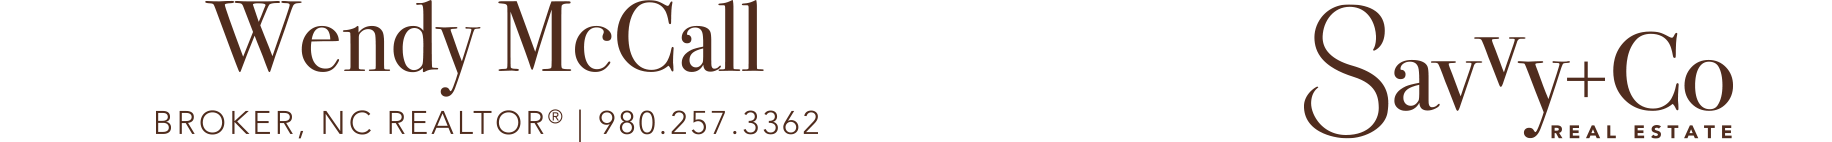 Wendy McCall, Broker, NC REALTOR® Logo